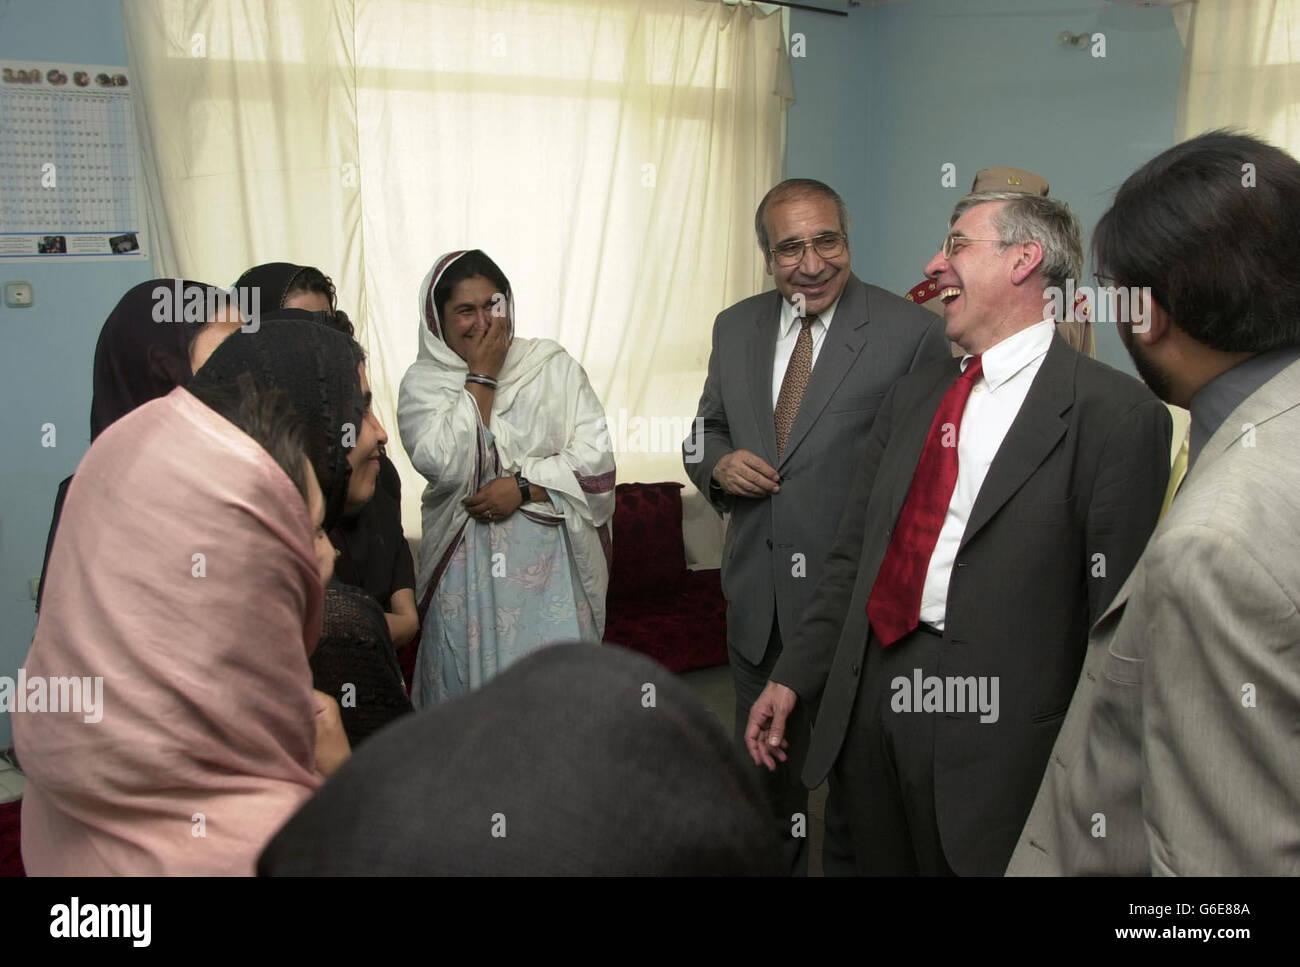 Jack Straw - Afghanistan Visit - Stock Image